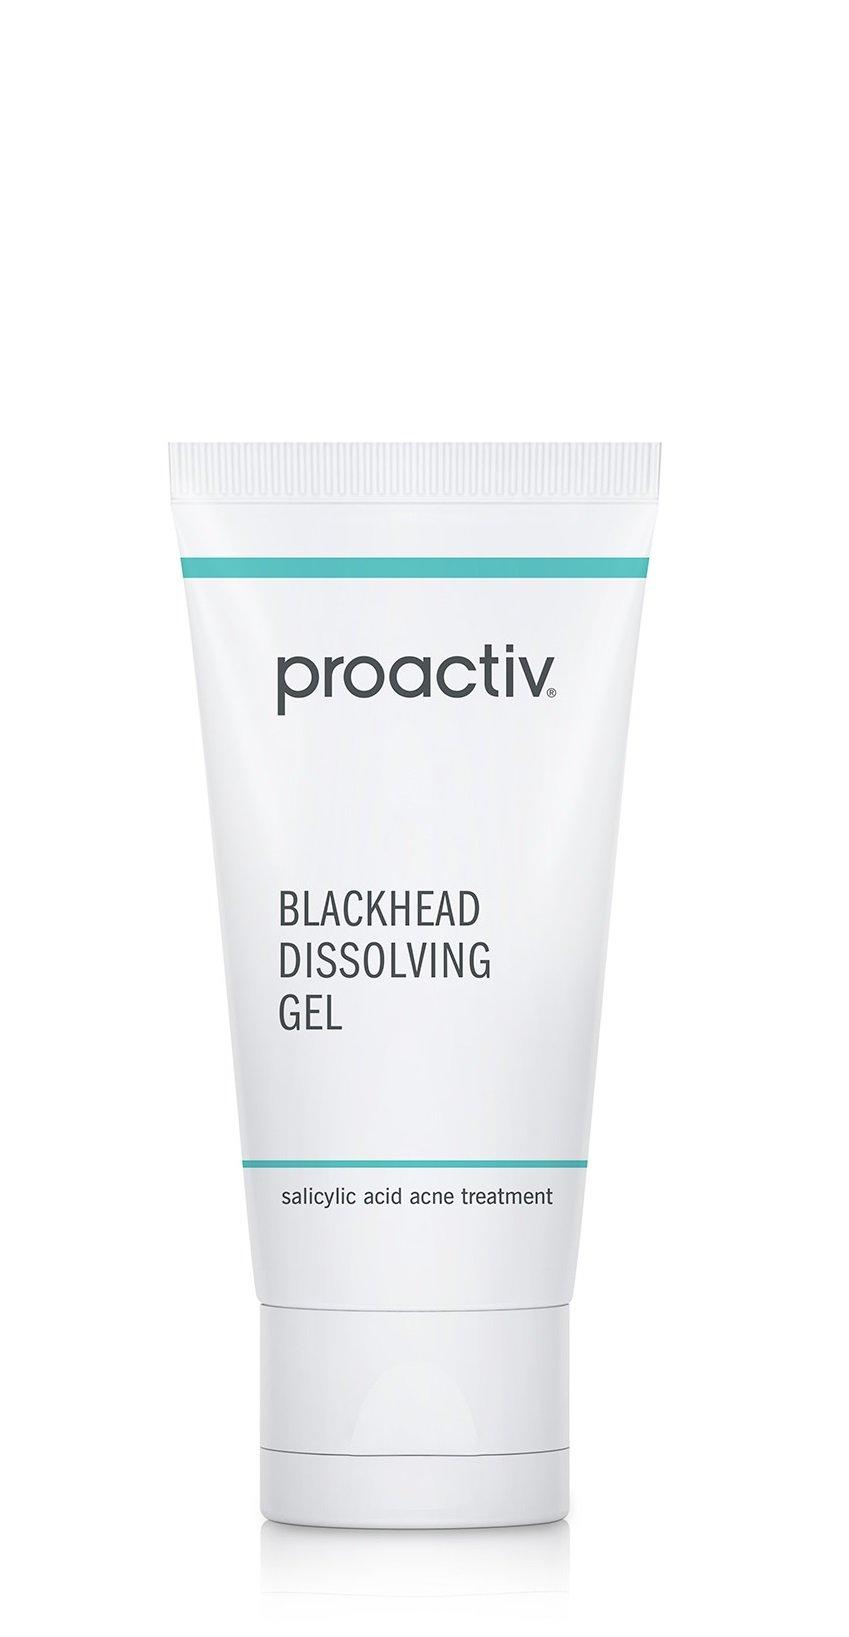 Proactiv Blackhead Dissolving Gel, 1 Ounce by Proactiv